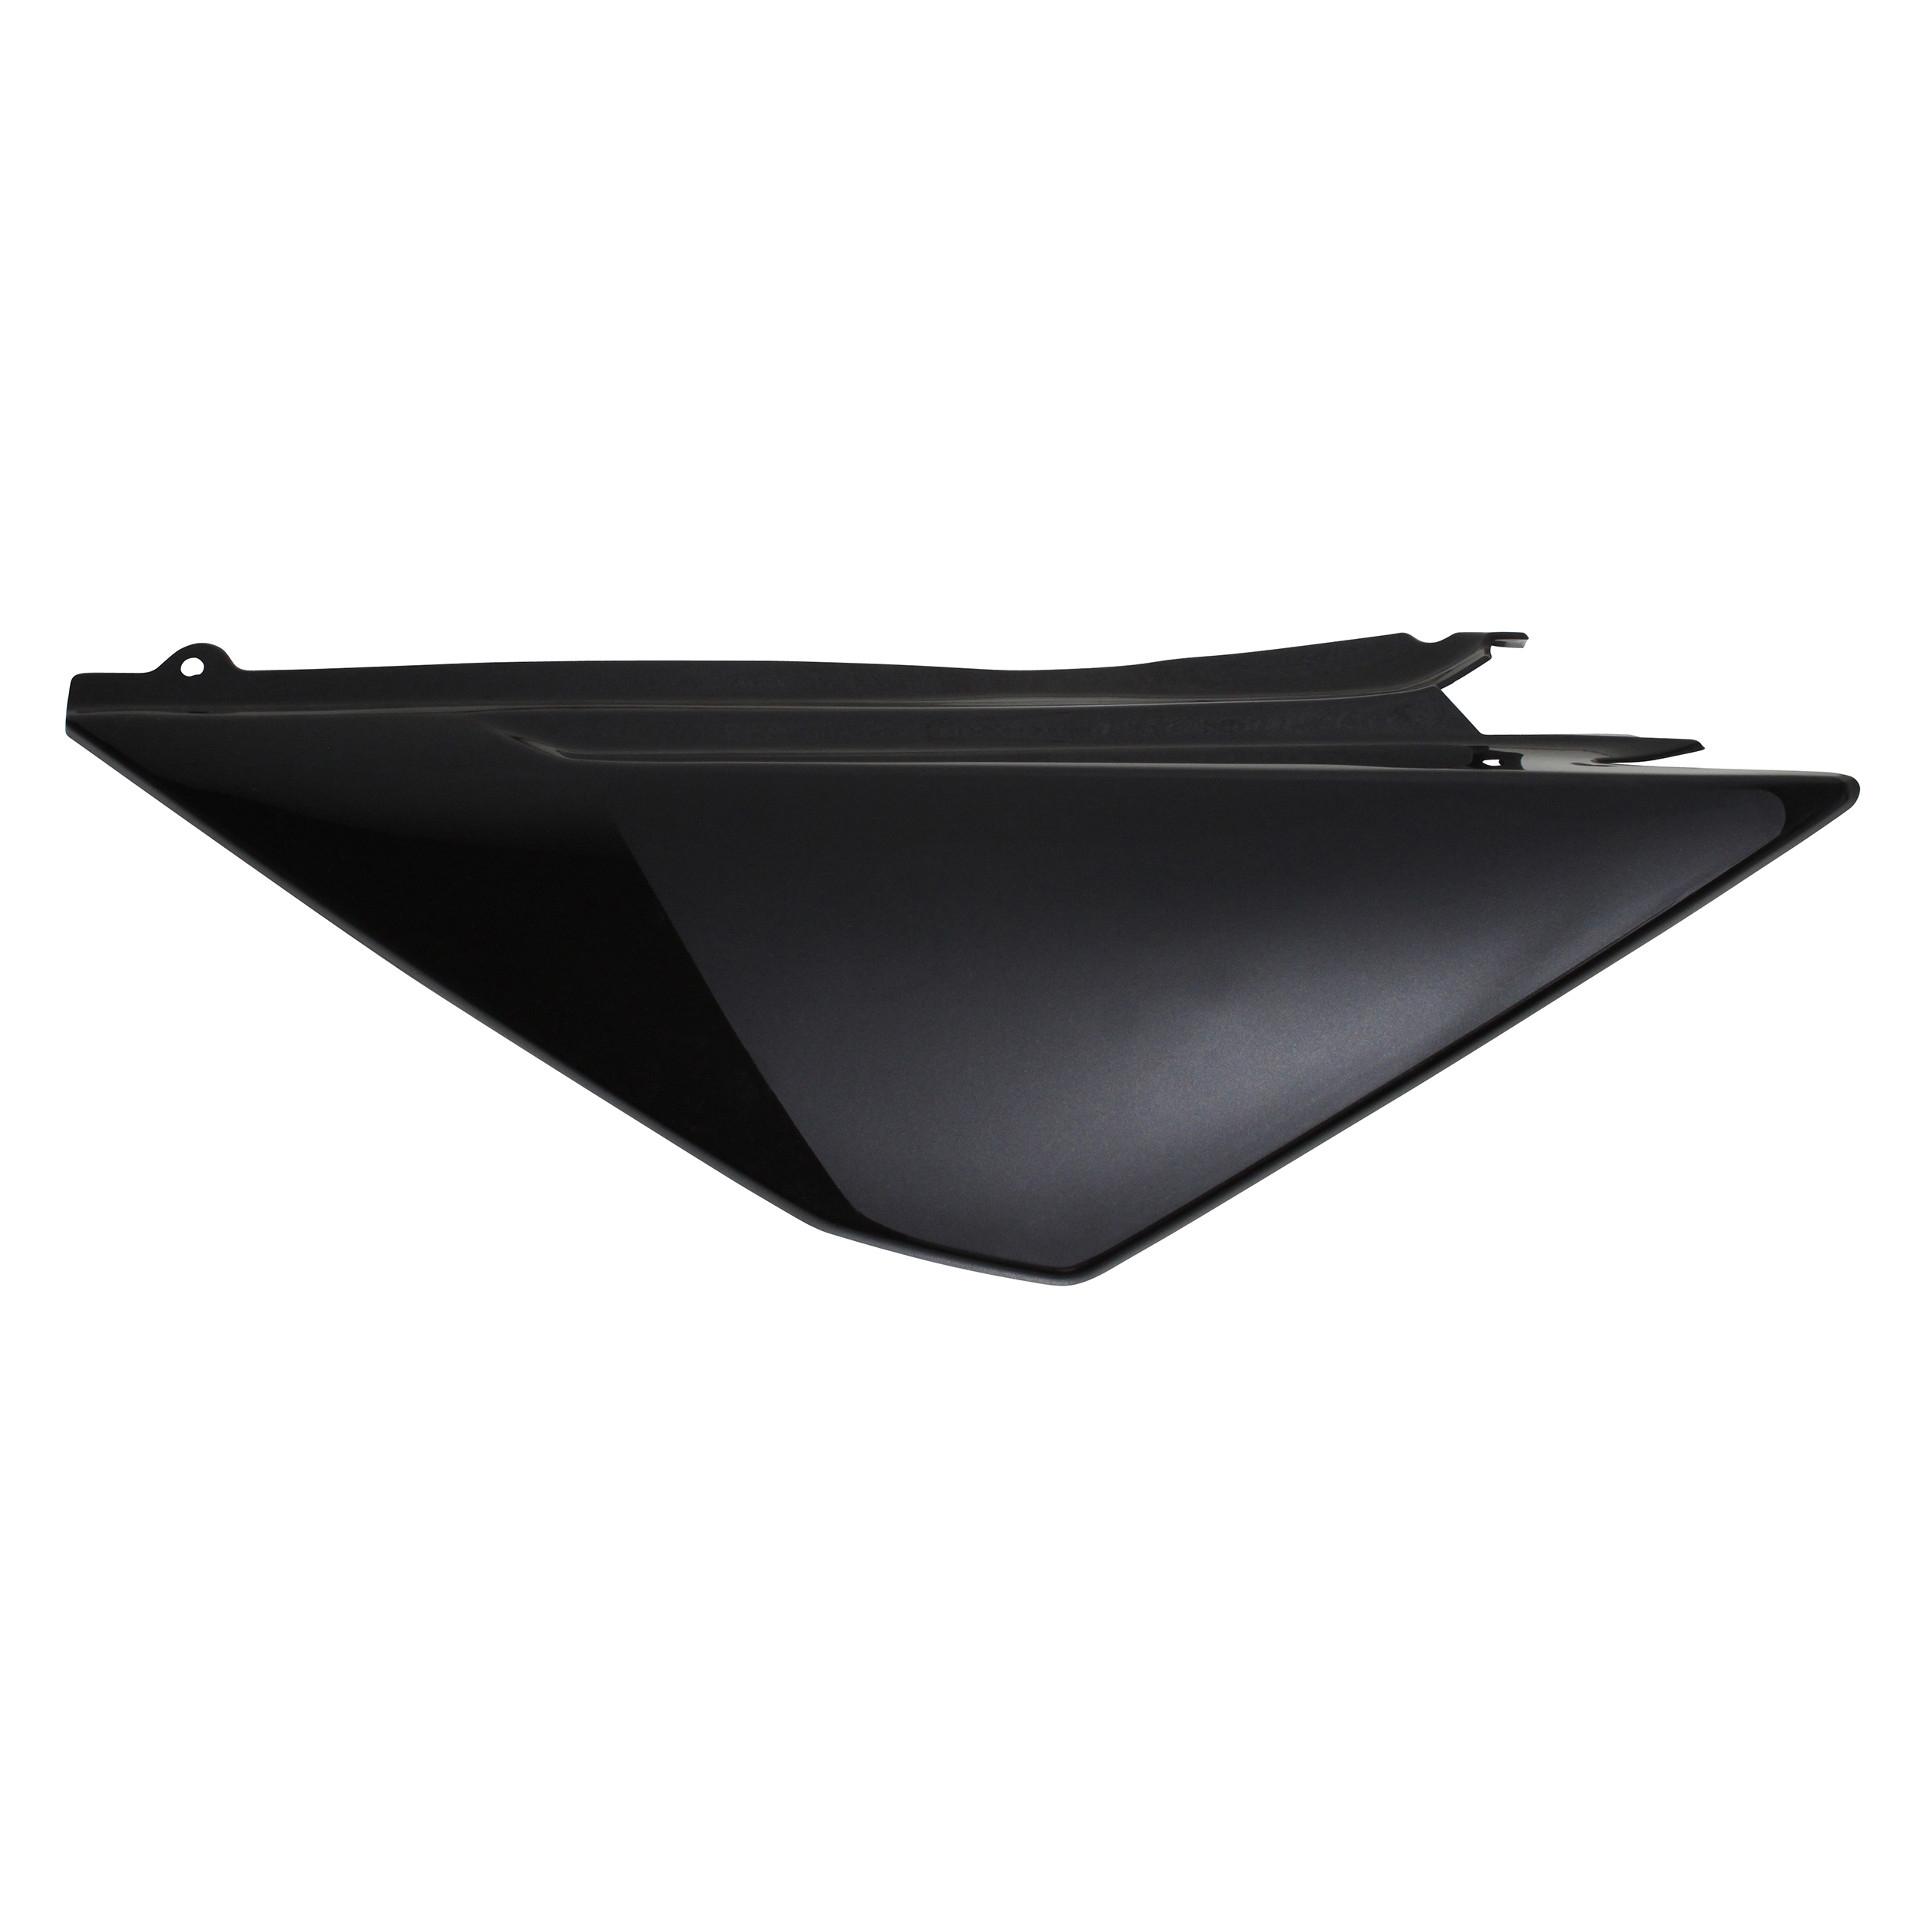 Coque arrière 1Tek Origine noir brillant gauche Derbi Senda DRD Racing